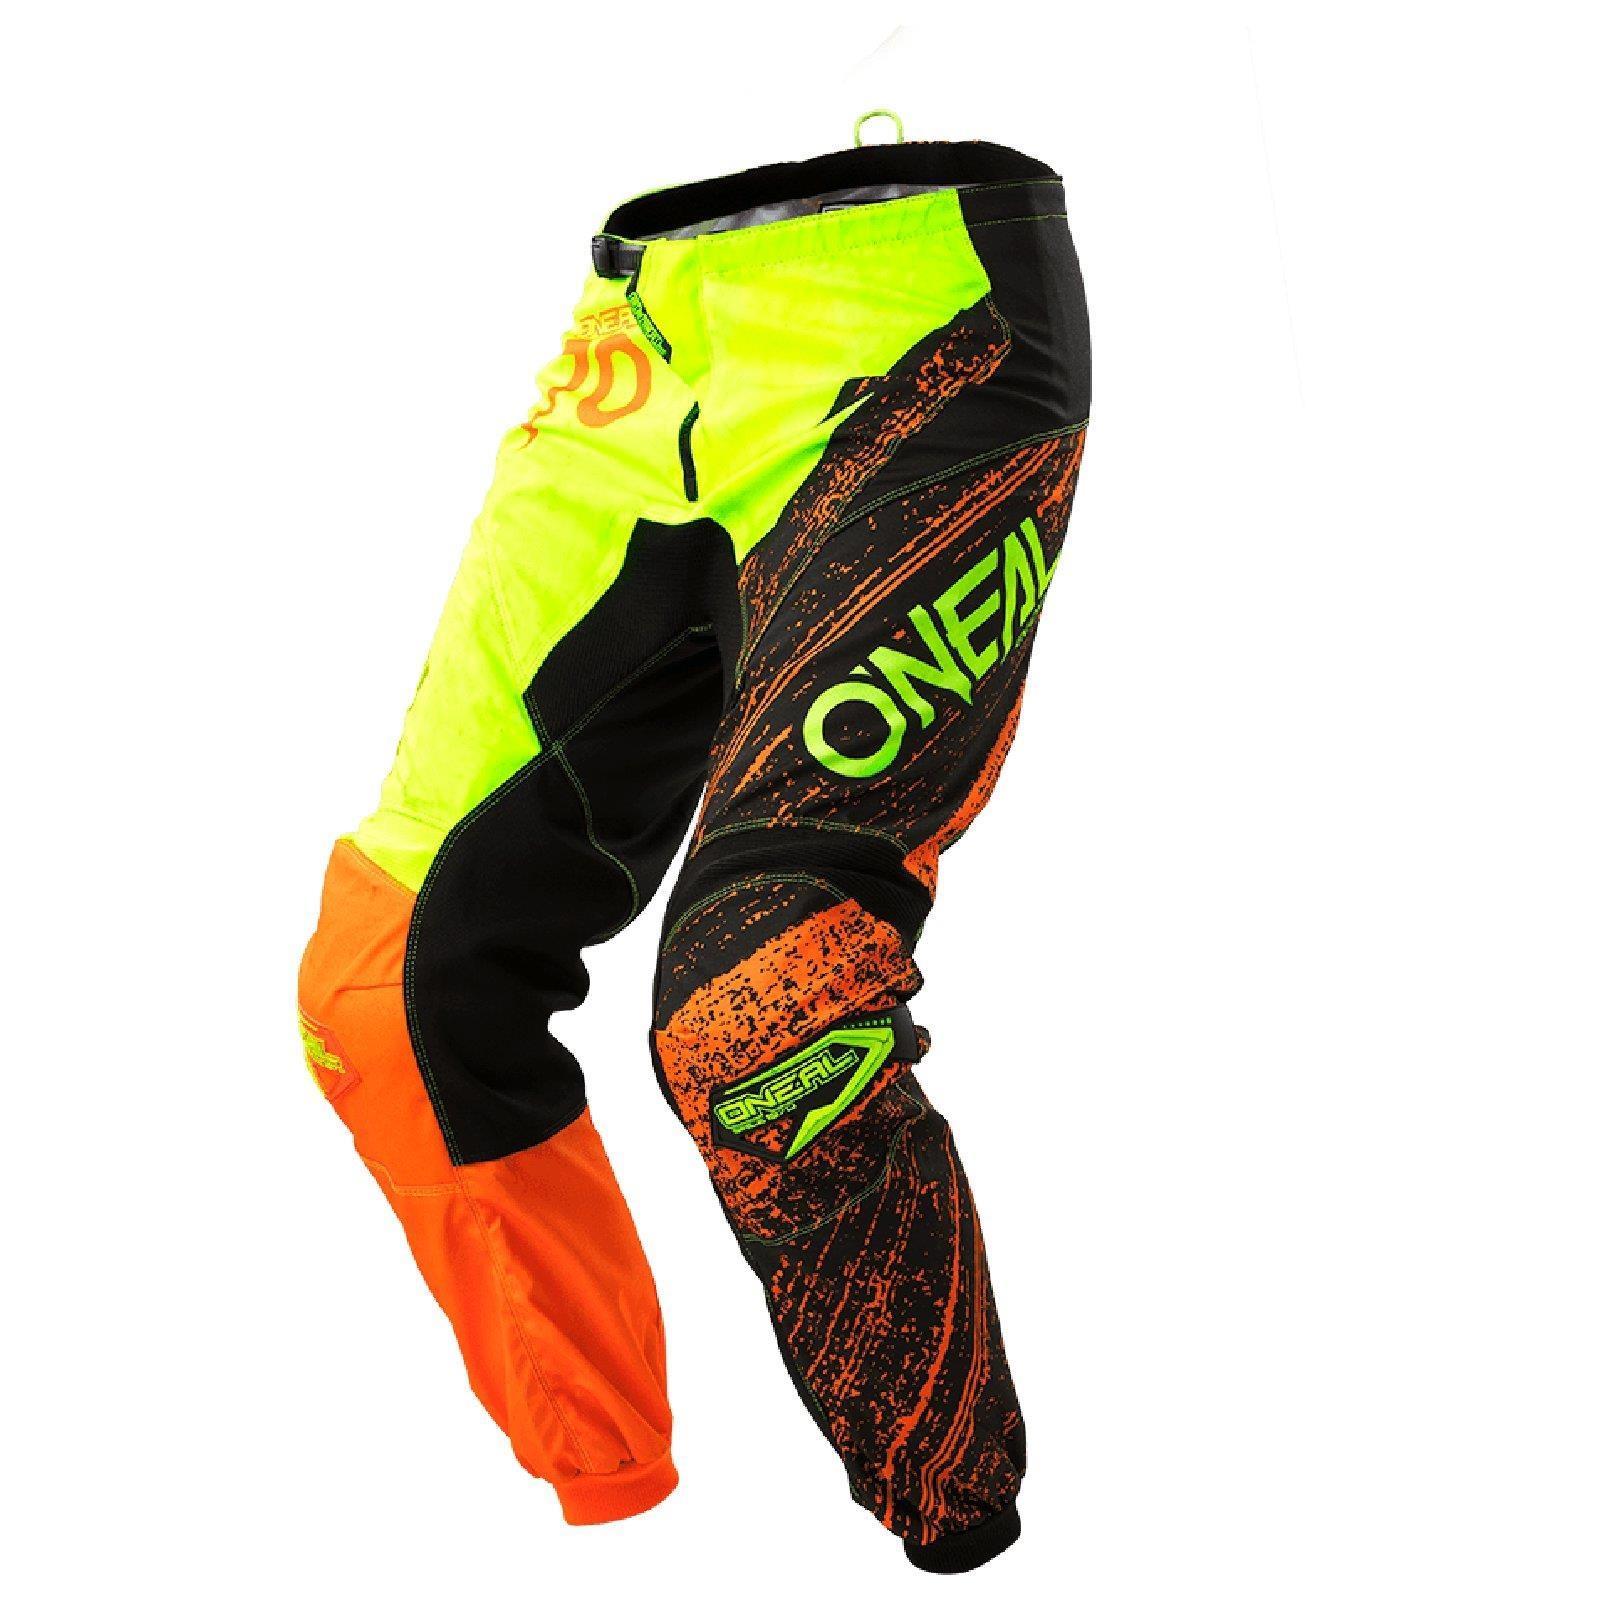 ONEAL-Element-Burnout-MX-Moto-Cross-Trousers-Pant-Enduro-Mountain-Bike-MTB-Downhill thumbnail 8